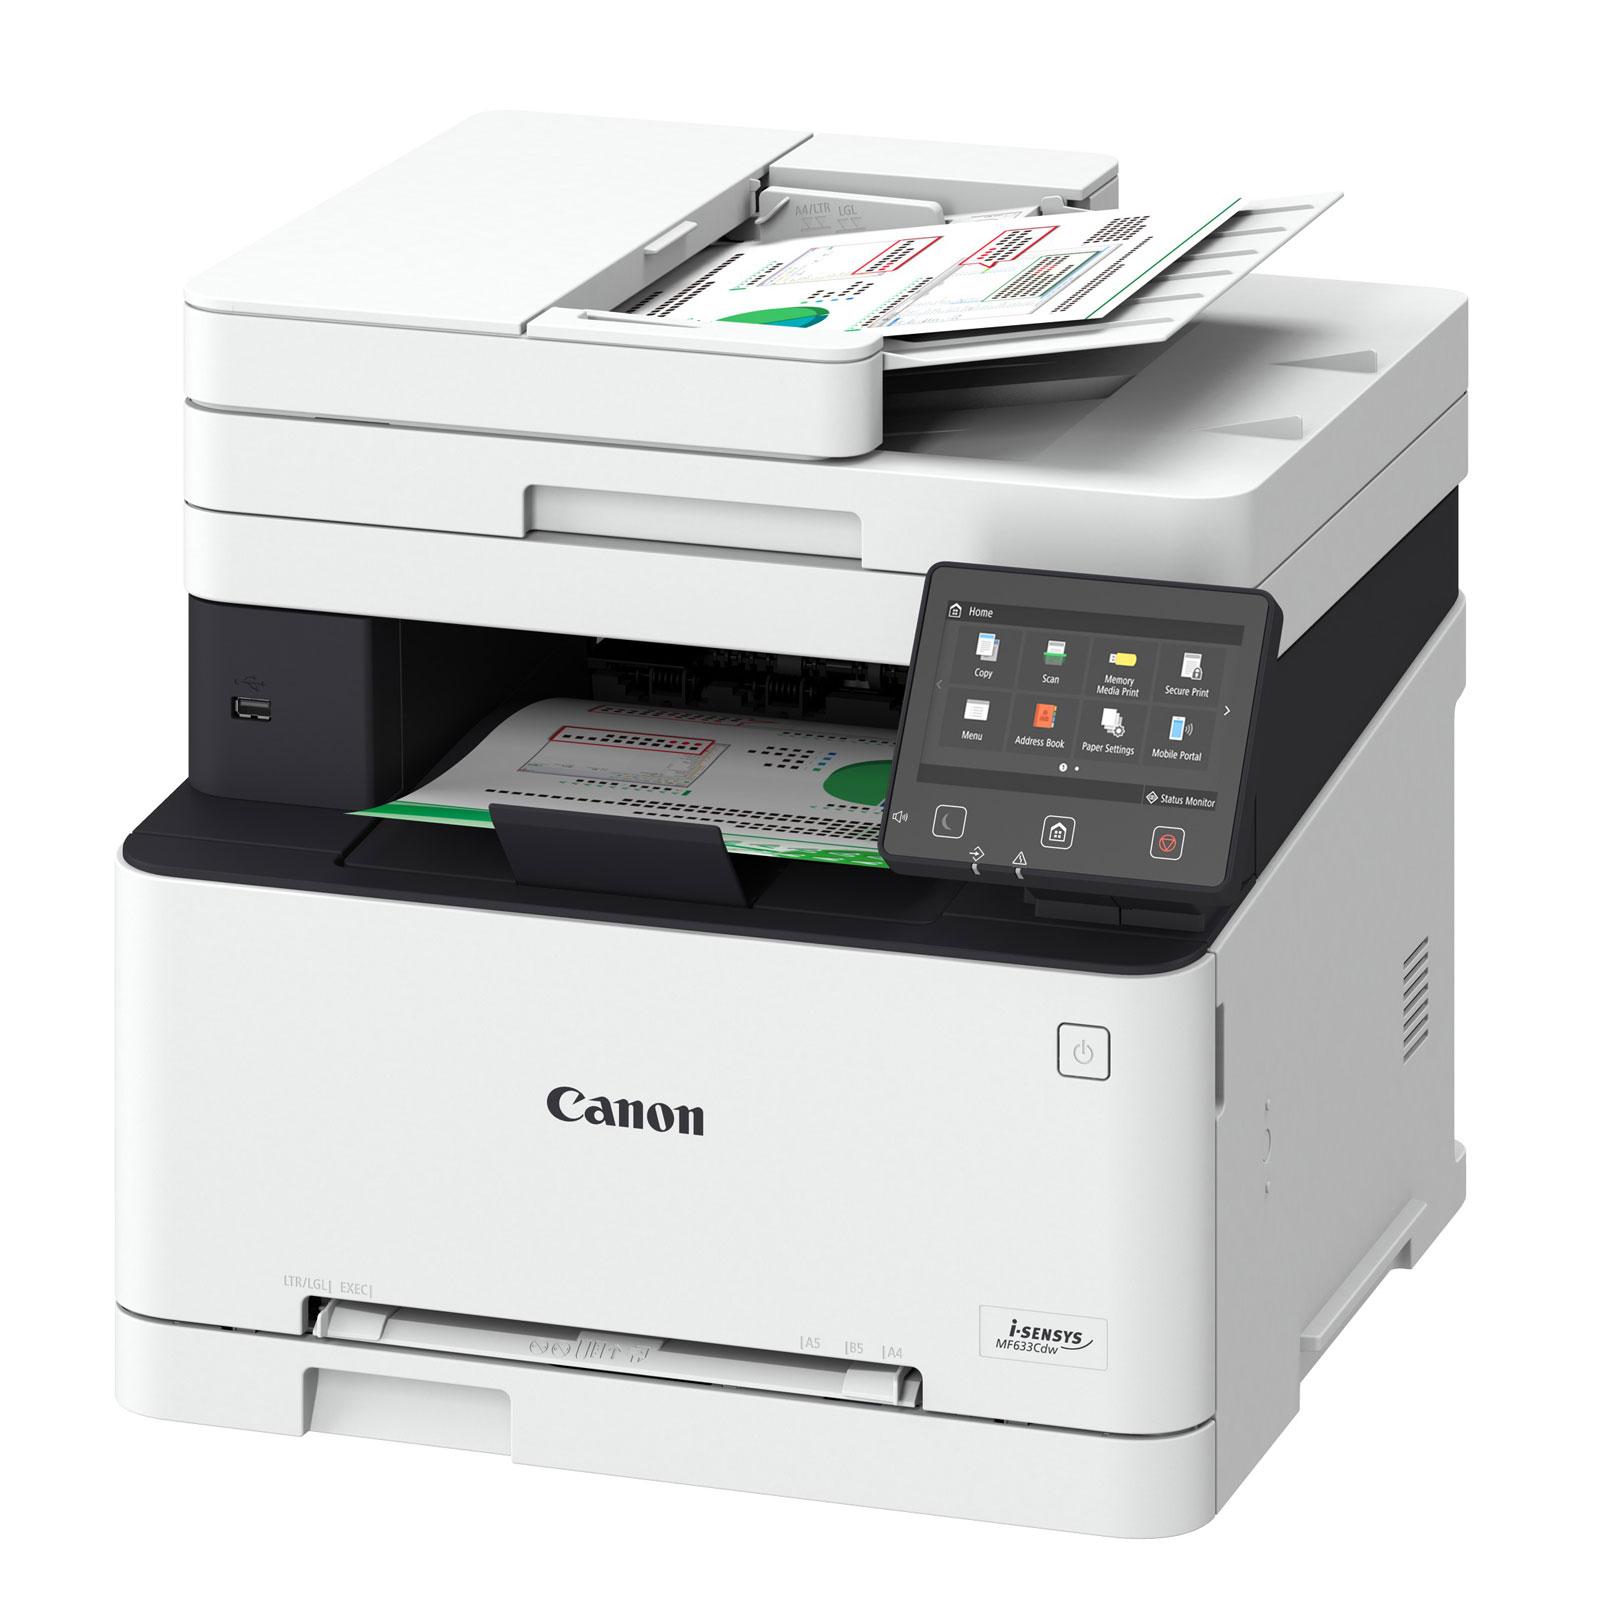 canon i sensys mf633cdw imprimante multifonction canon. Black Bedroom Furniture Sets. Home Design Ideas